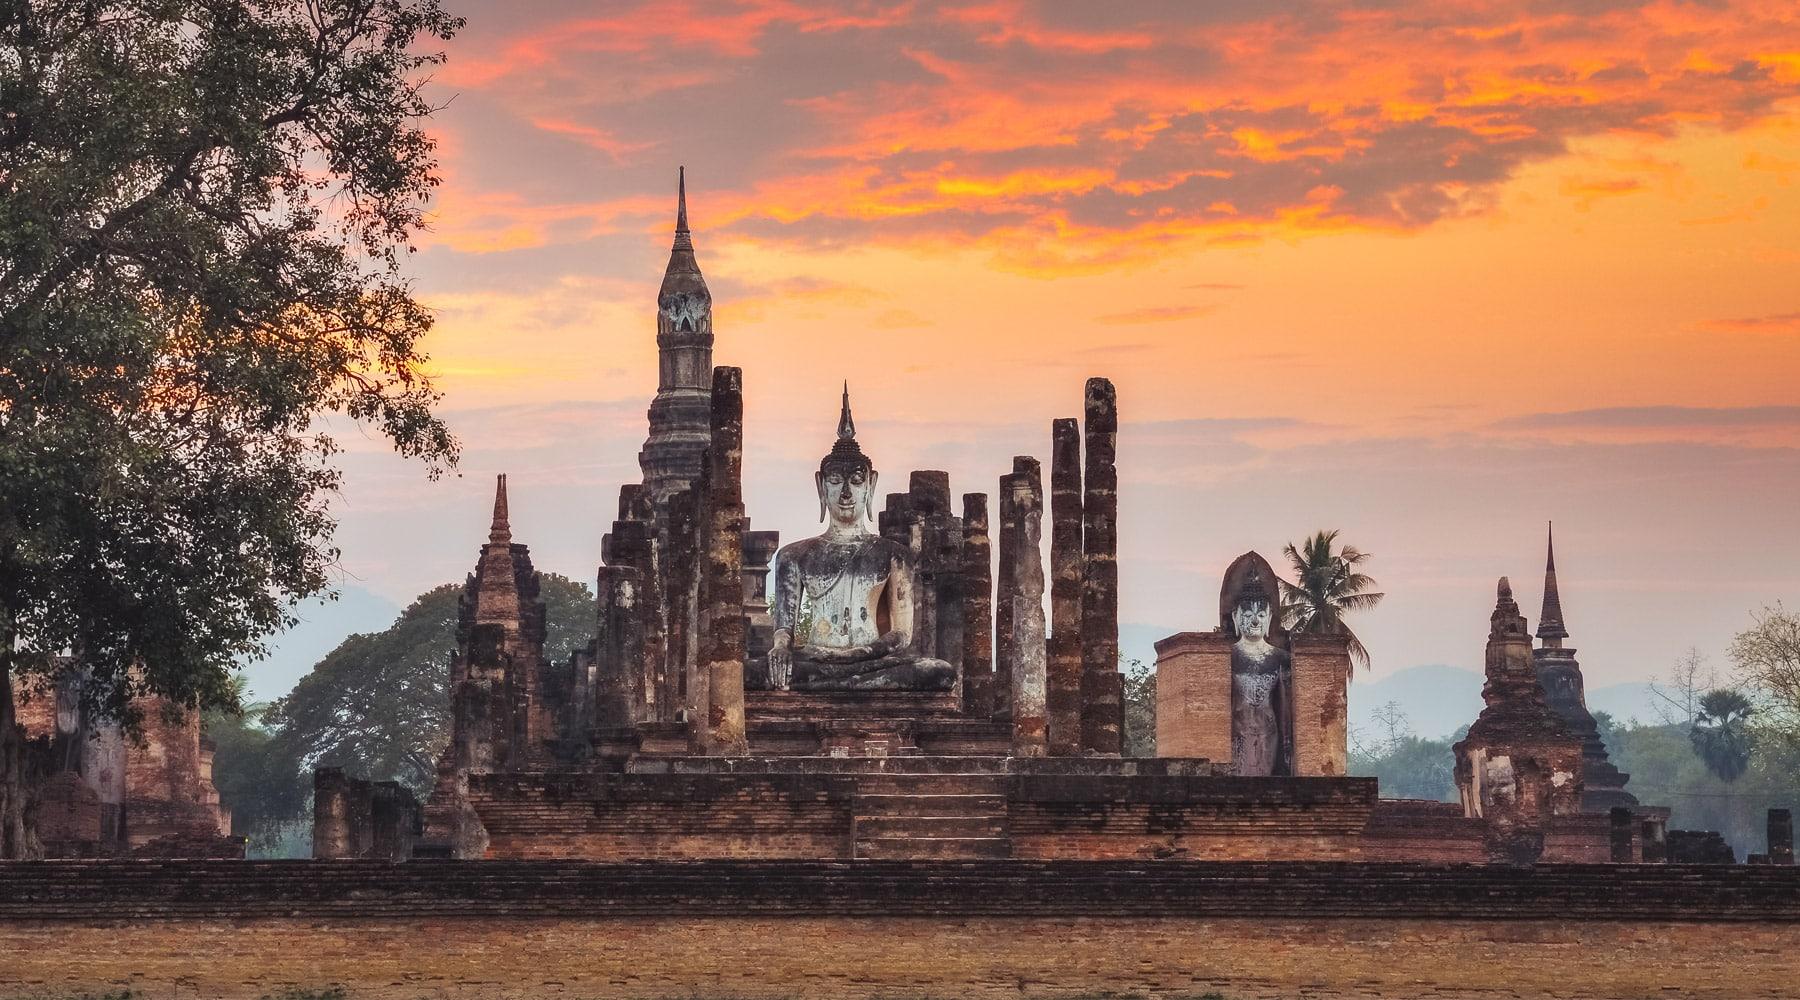 Historic Town of Sukhothai in Thailand